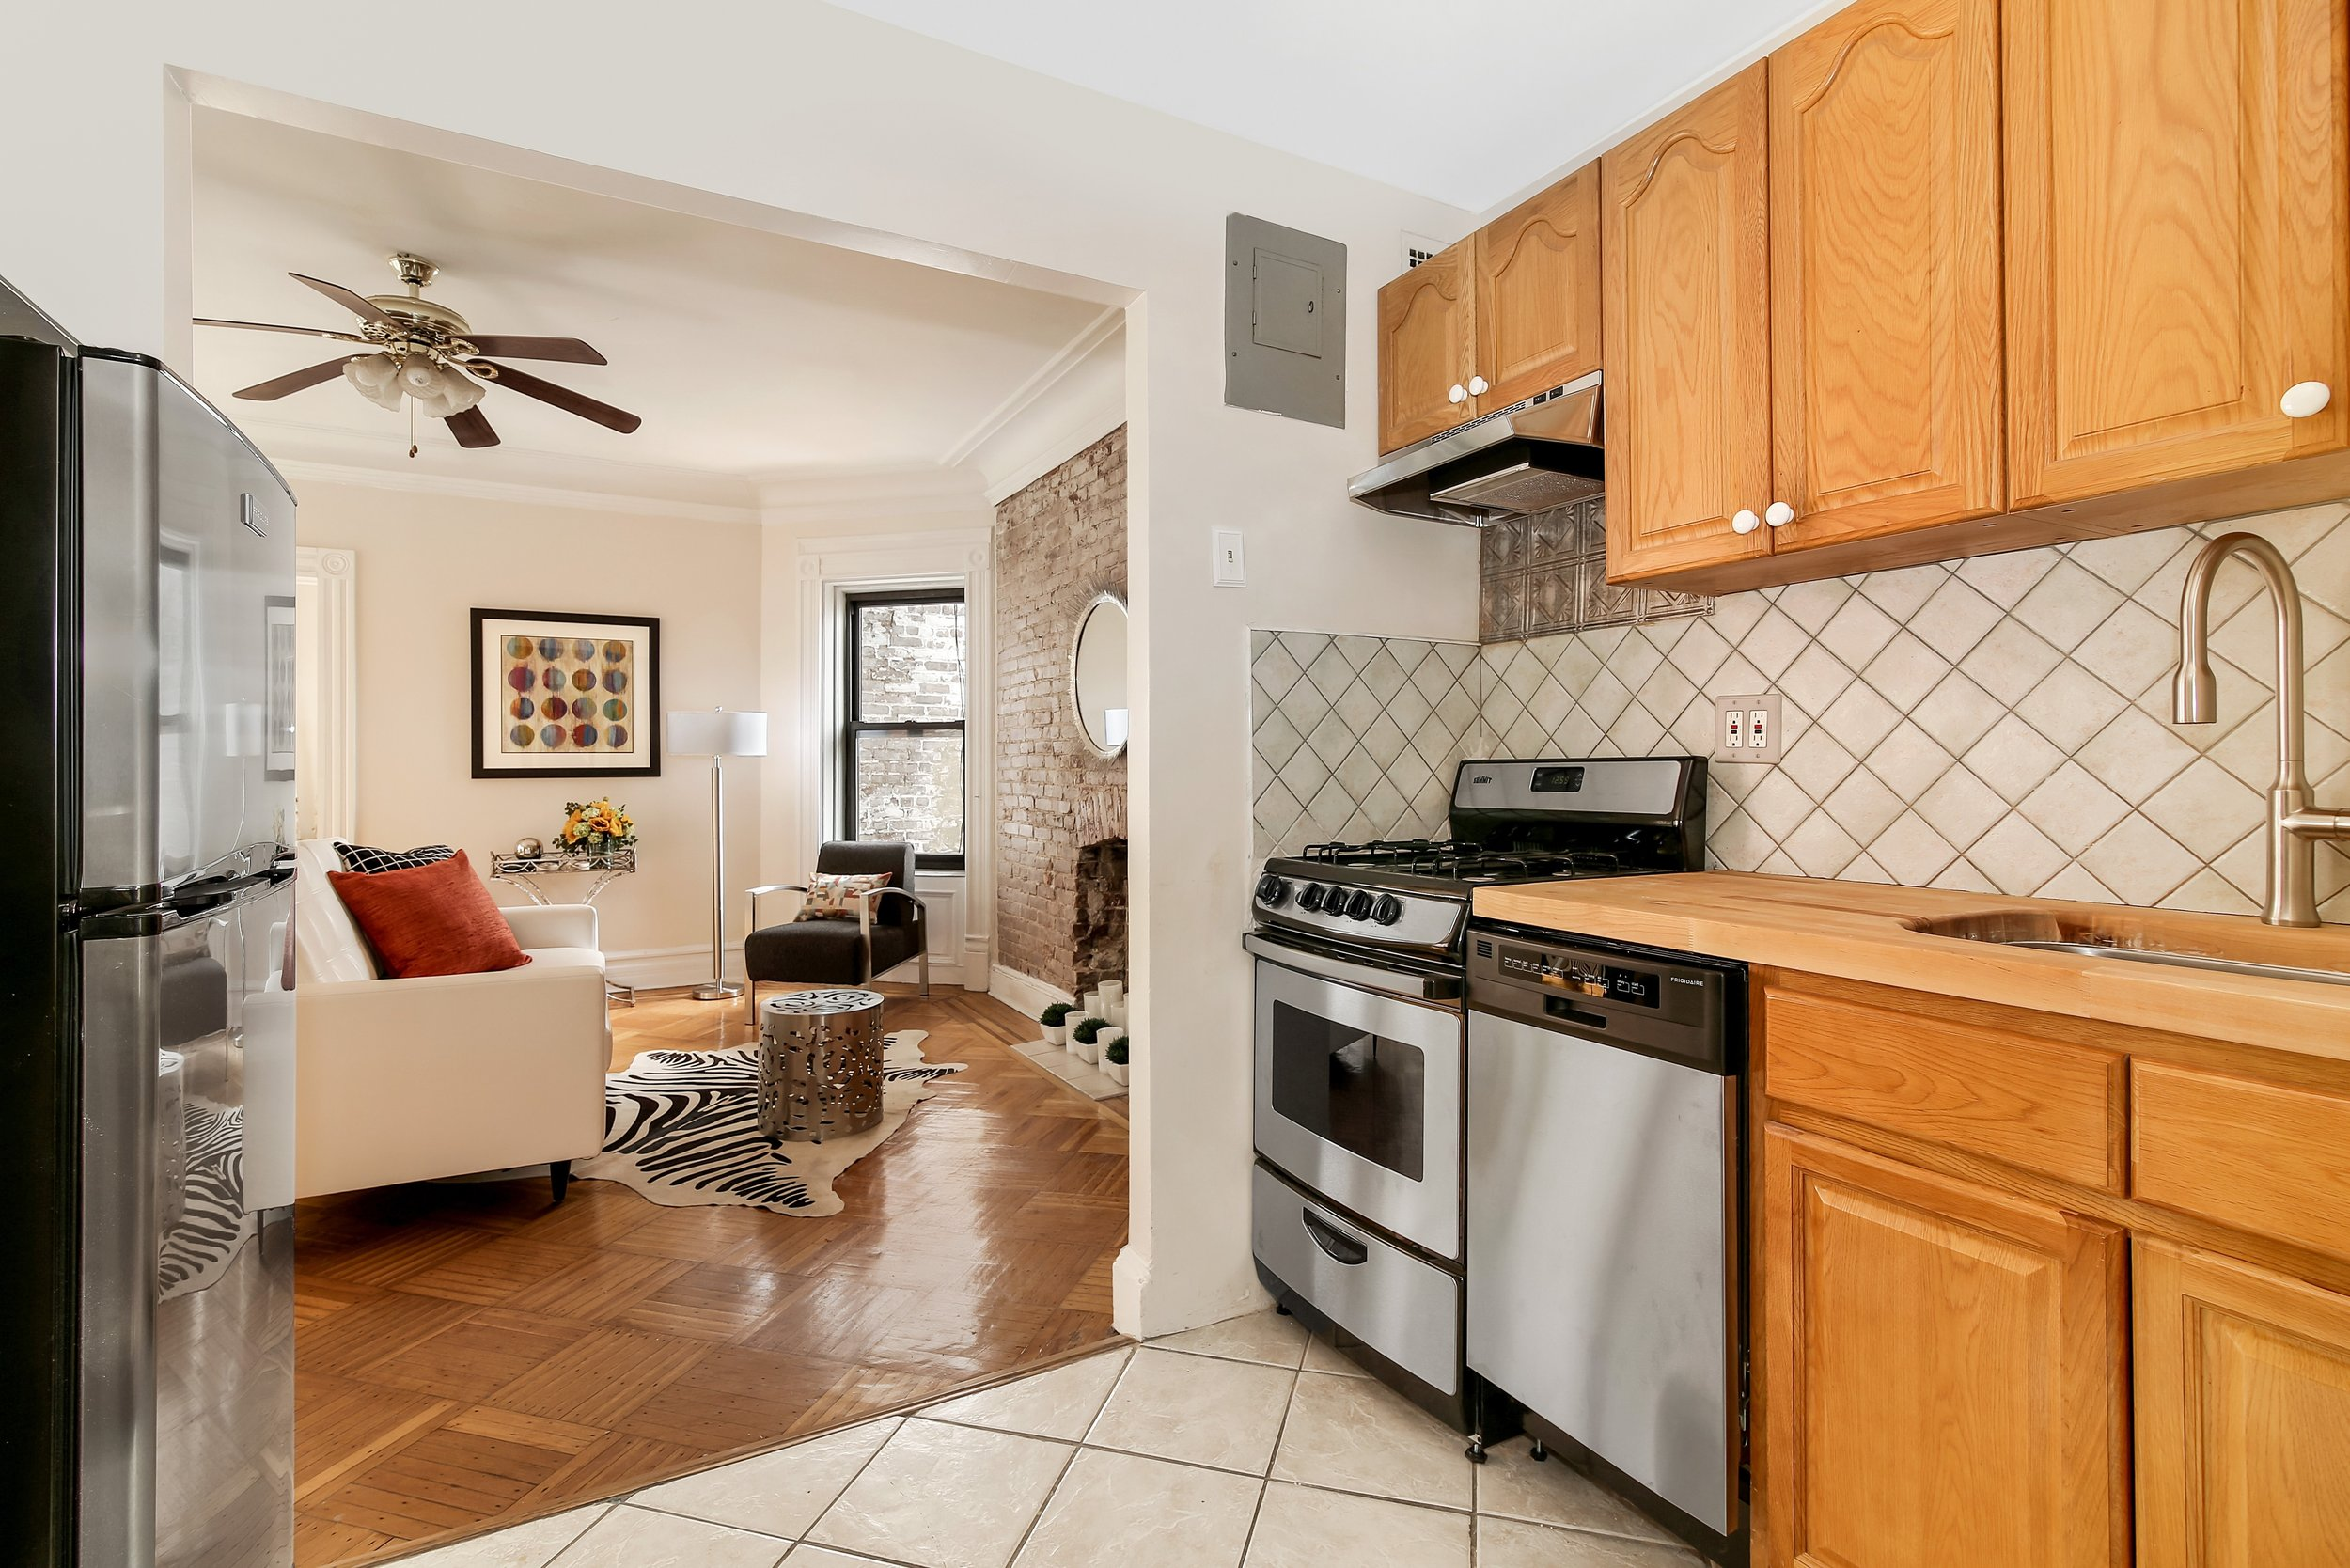 184 Clinton Ave kitchen.jpg